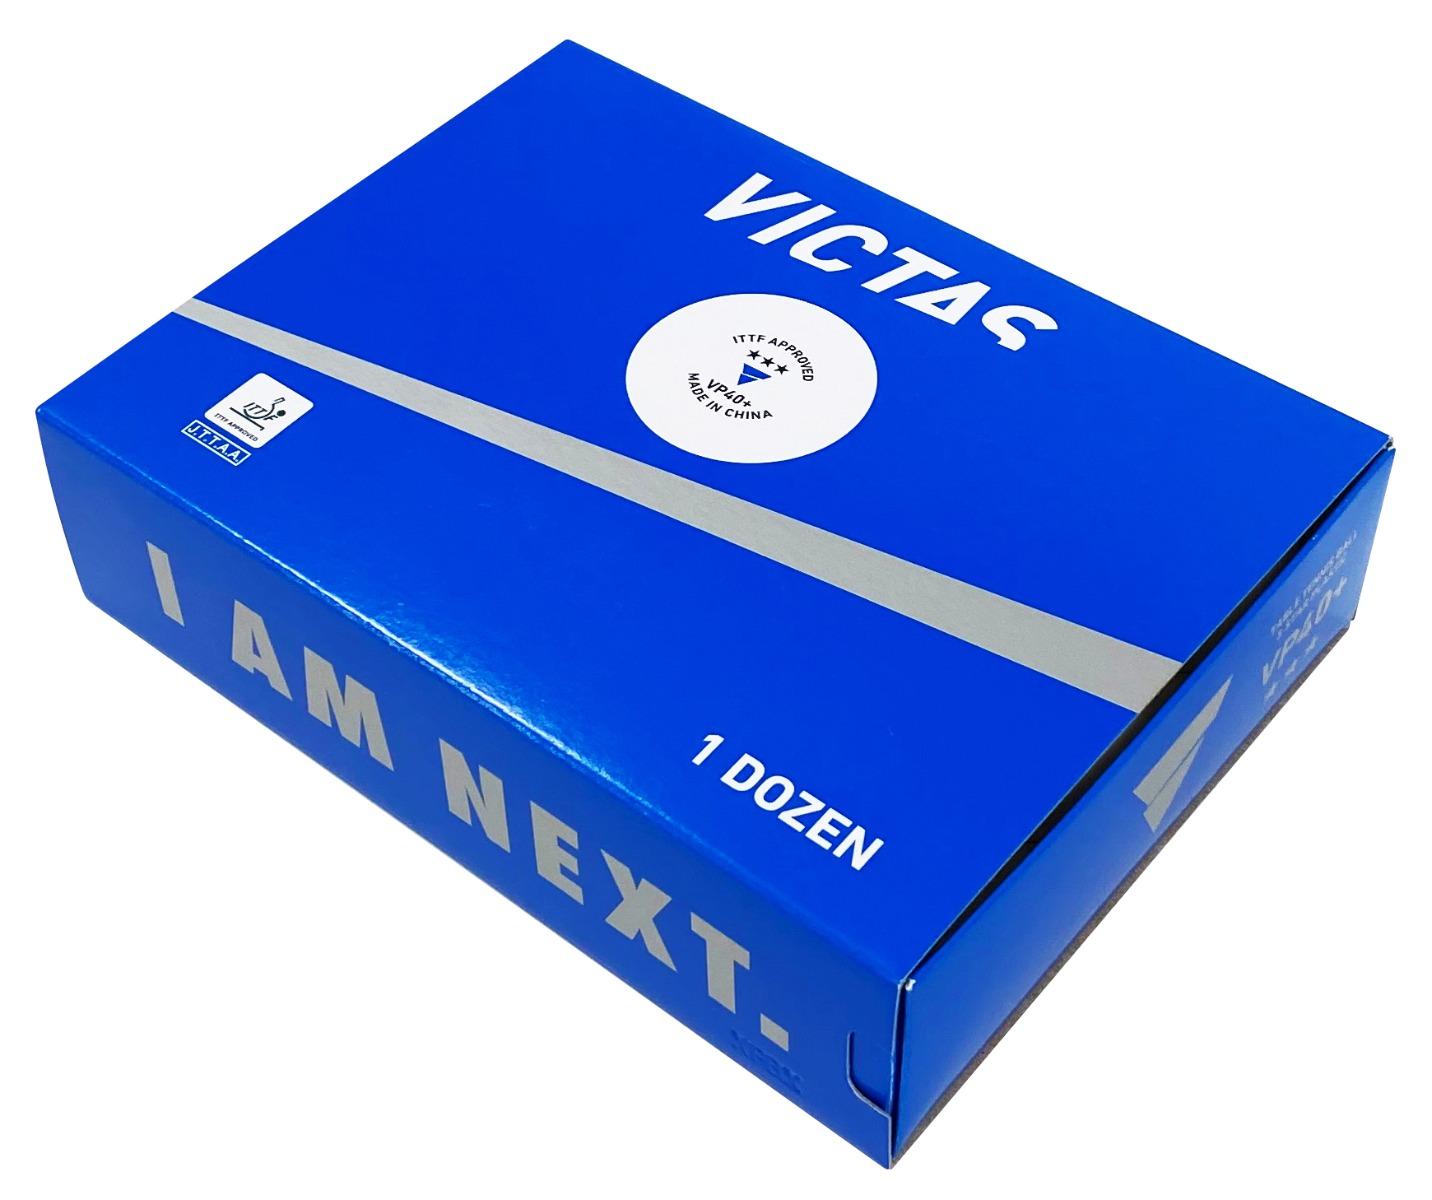 VICTAS 卓球 ボール VP40+3スター 1ダース入 3スターボール 公認球 トレーニングボール